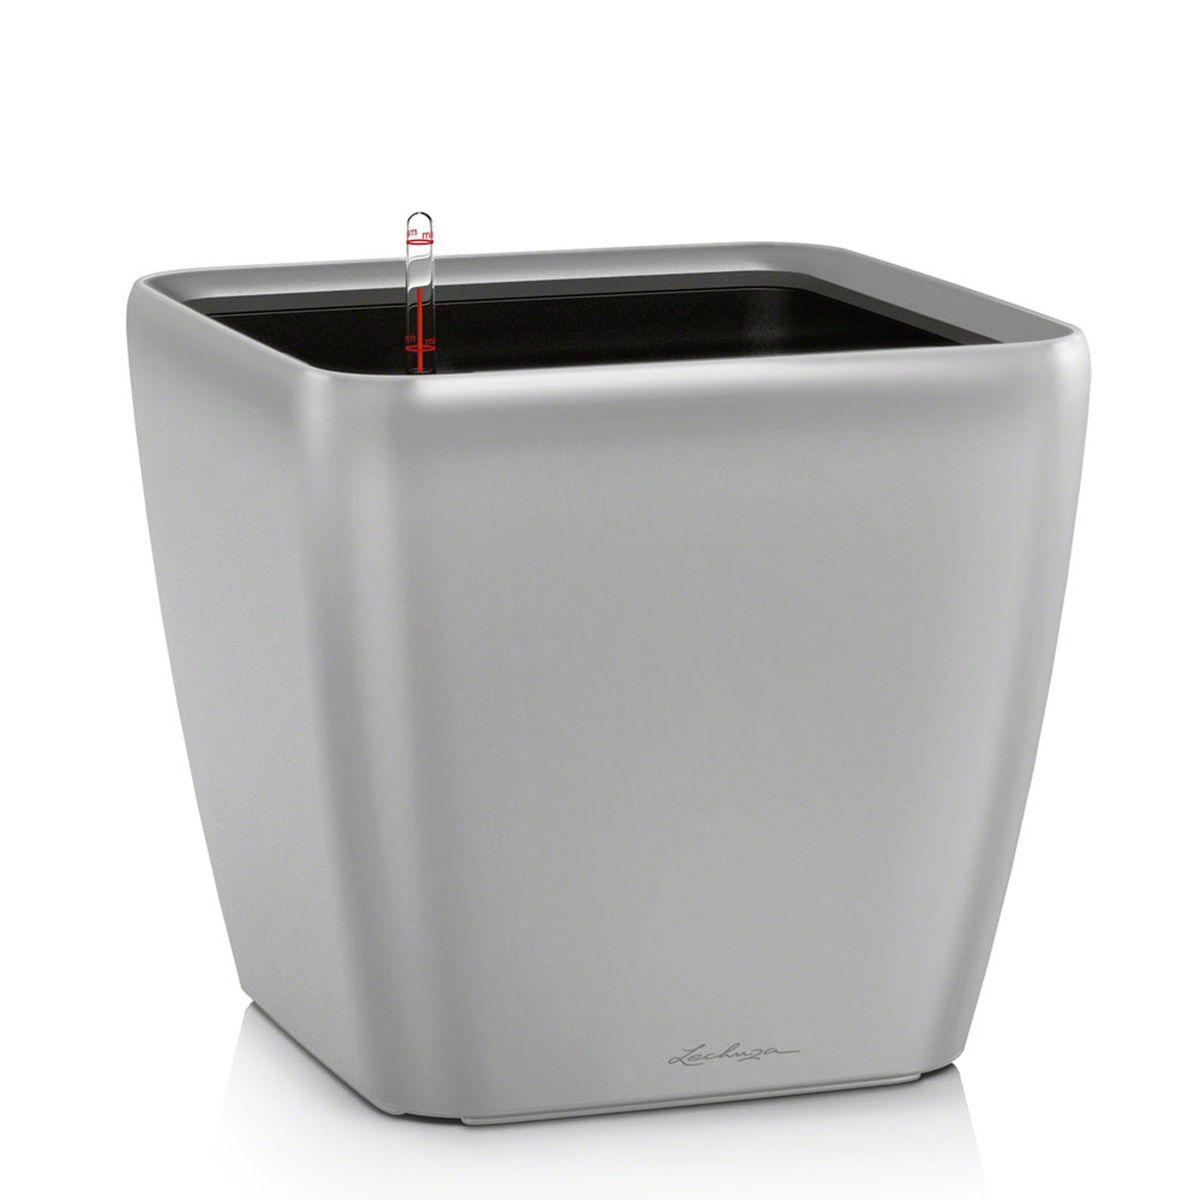 "Кашпо Lechuza ""Quadro"", с системой автополива, цвет: серебристый, 33 х 33 х 35 см"